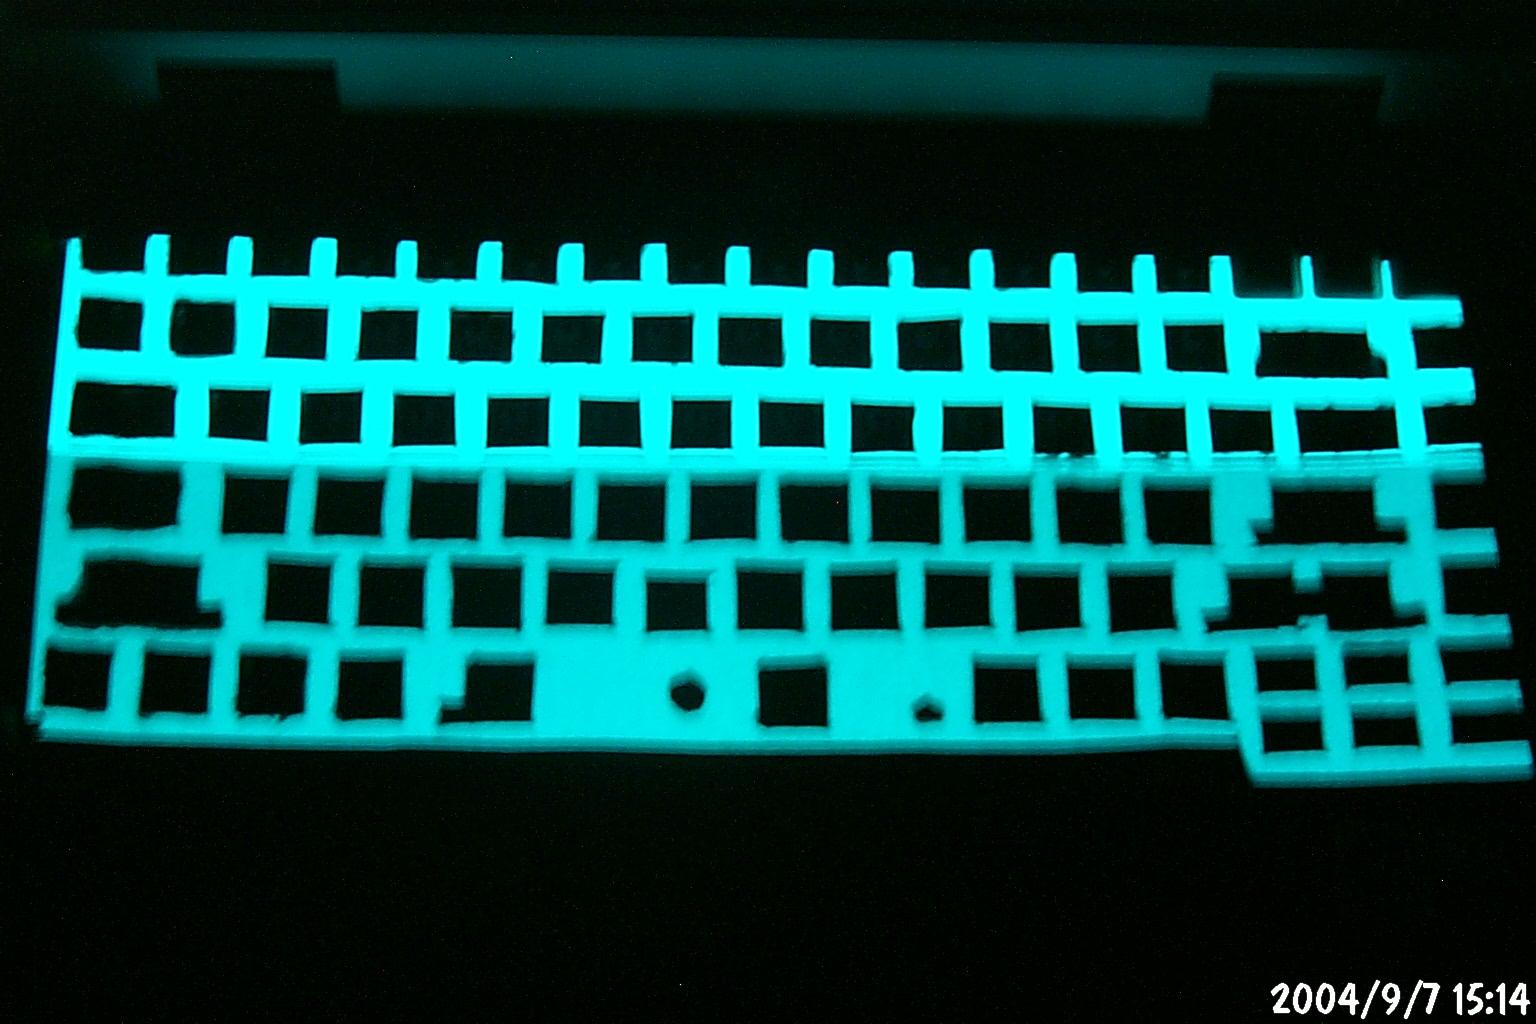 Asus M6Ne ElectroLuminescent Keyboard Experiment